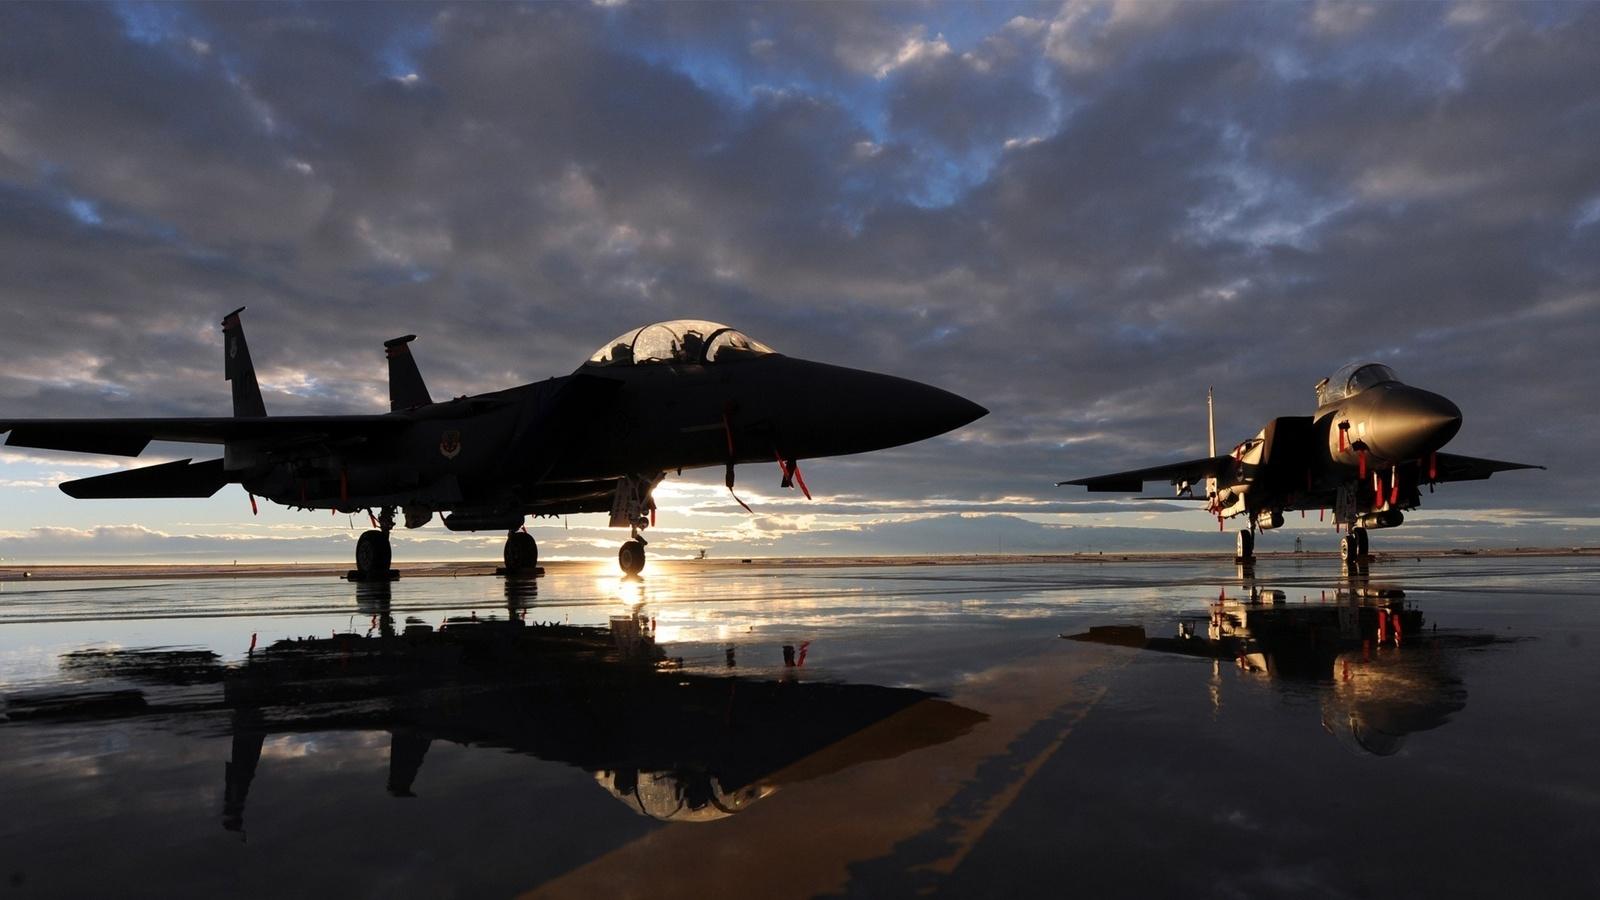 Обои Mcdonnell douglas, истребитель, Самолёт, eagle, Облака. Авиация foto 7